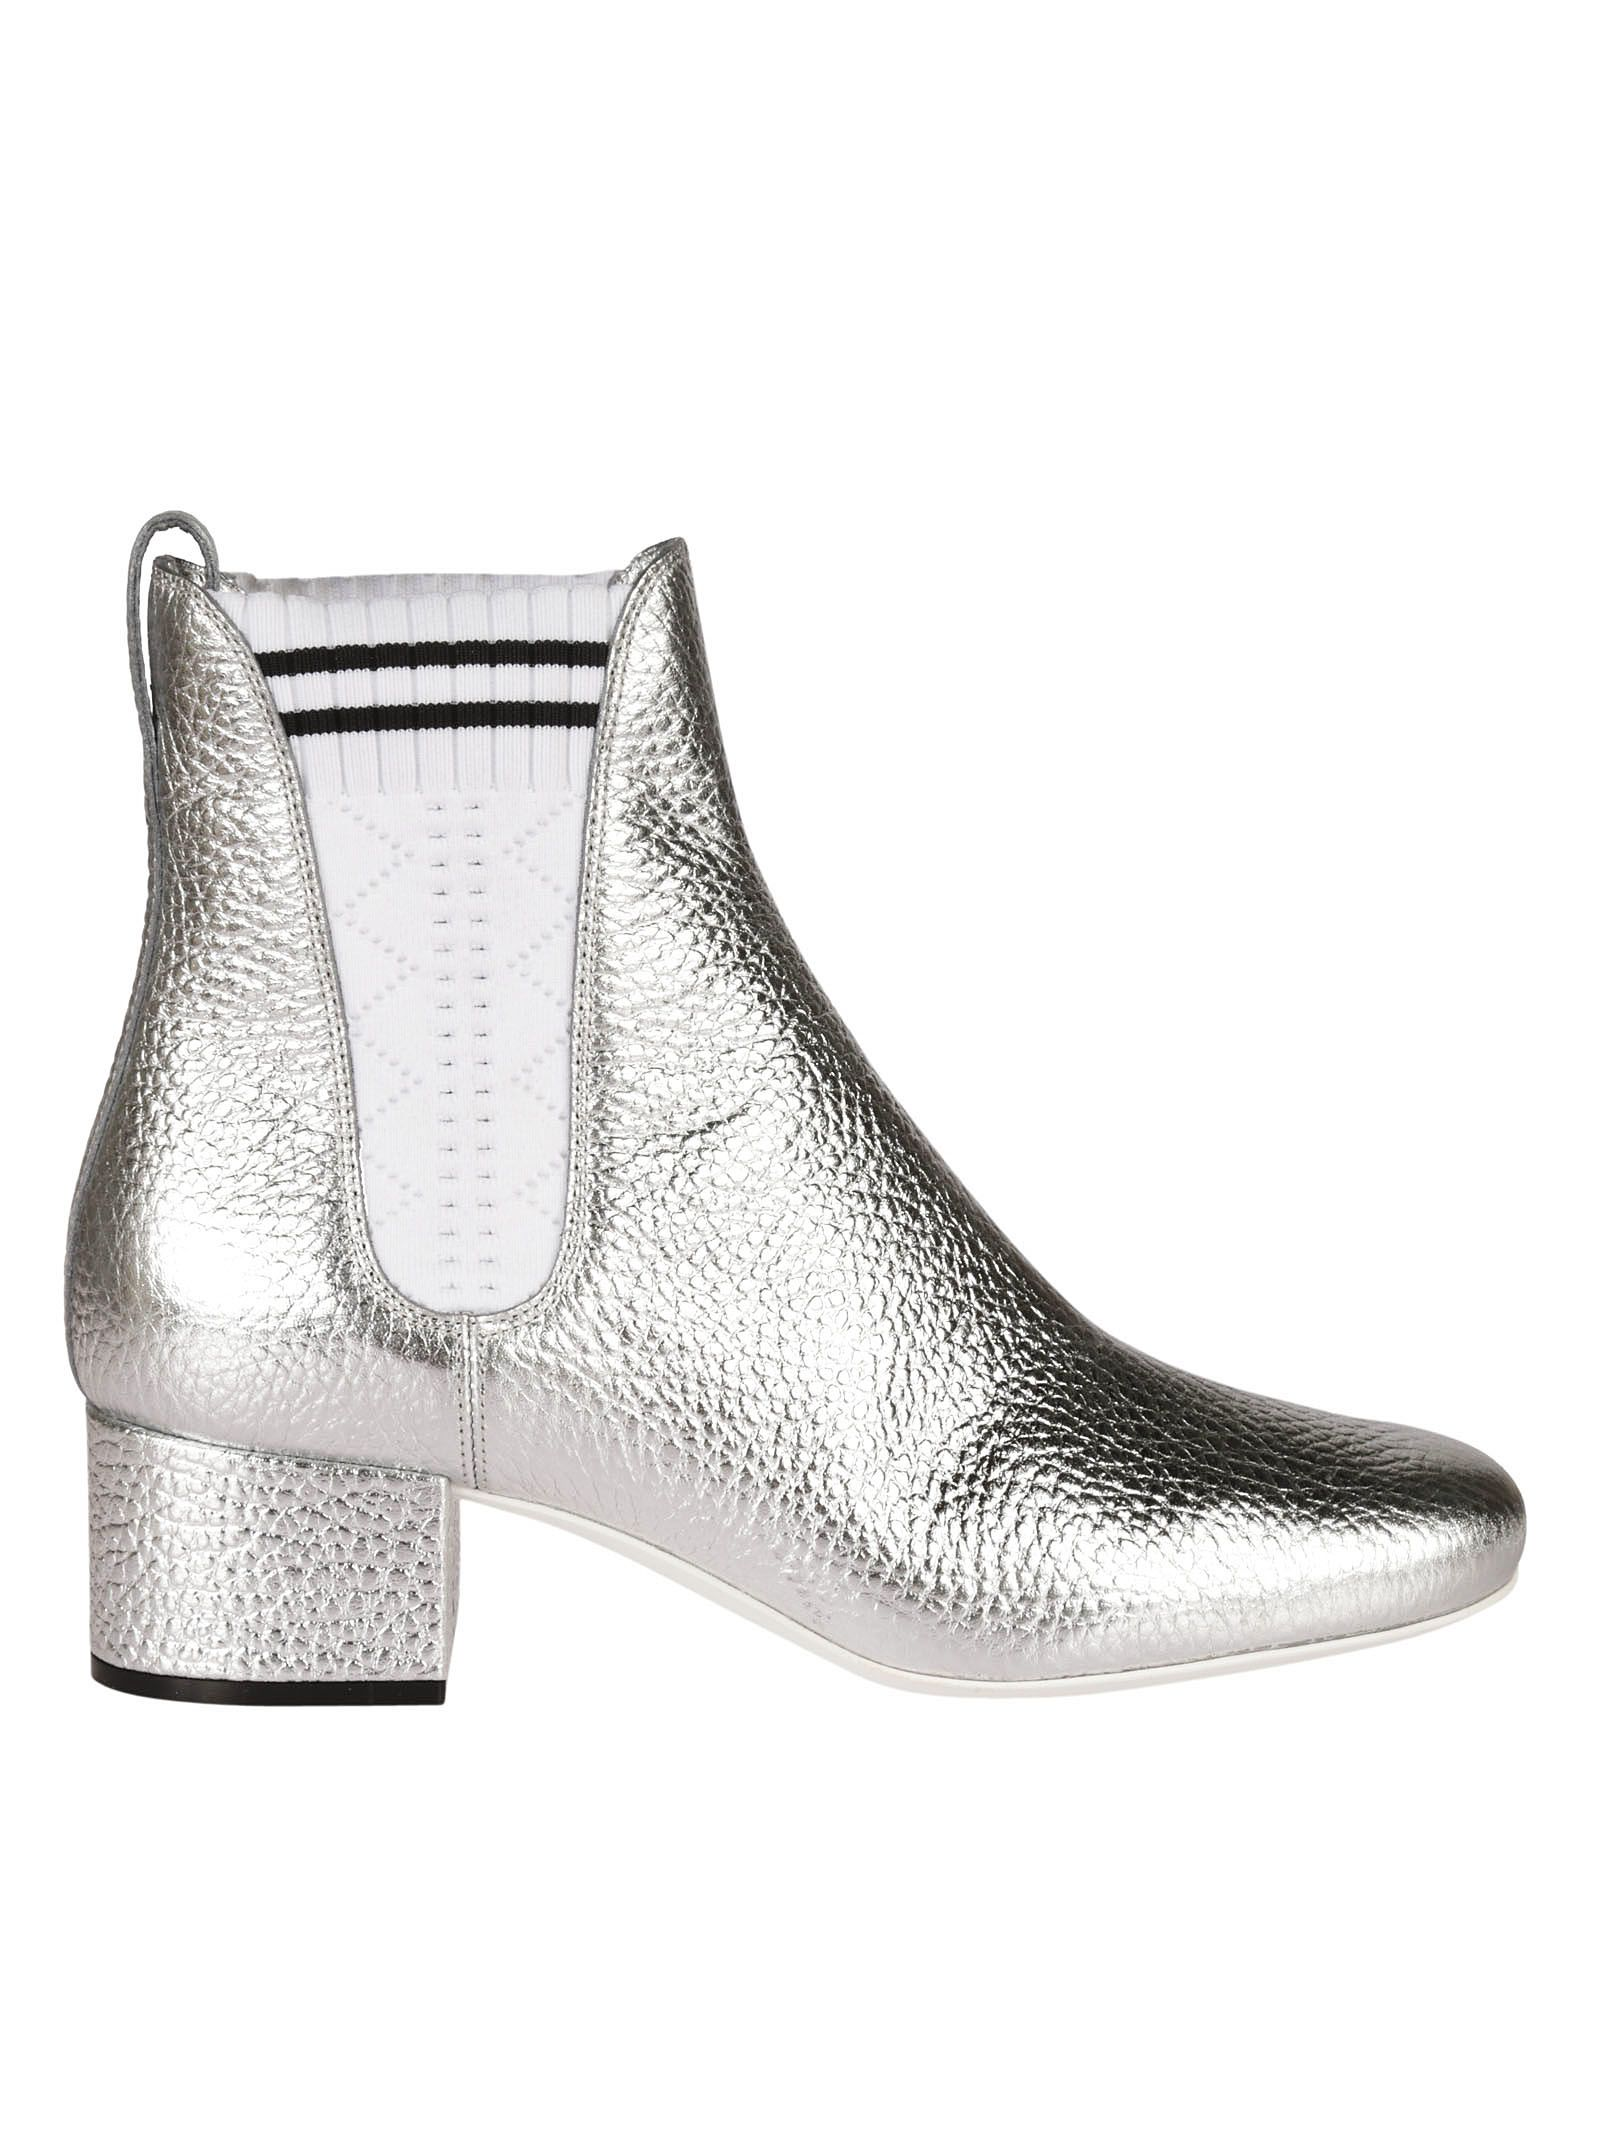 Fendi Chelsea Ankle Boots